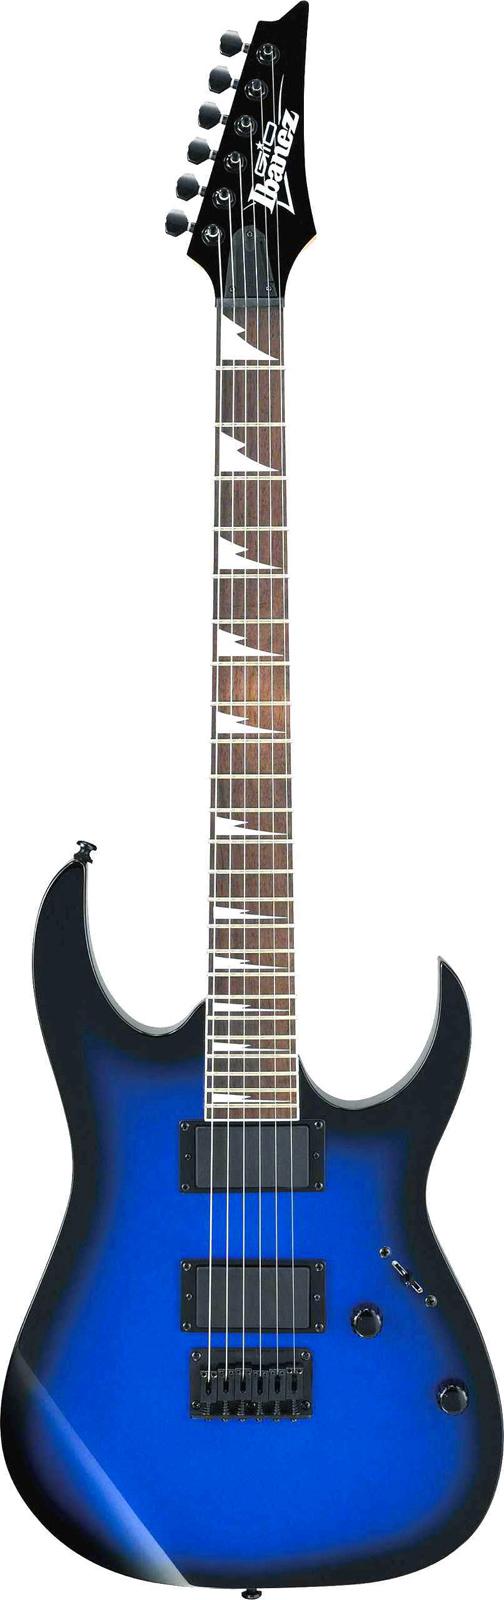 Ibanez Grg121dx-sls Starlight Blue Sunburst